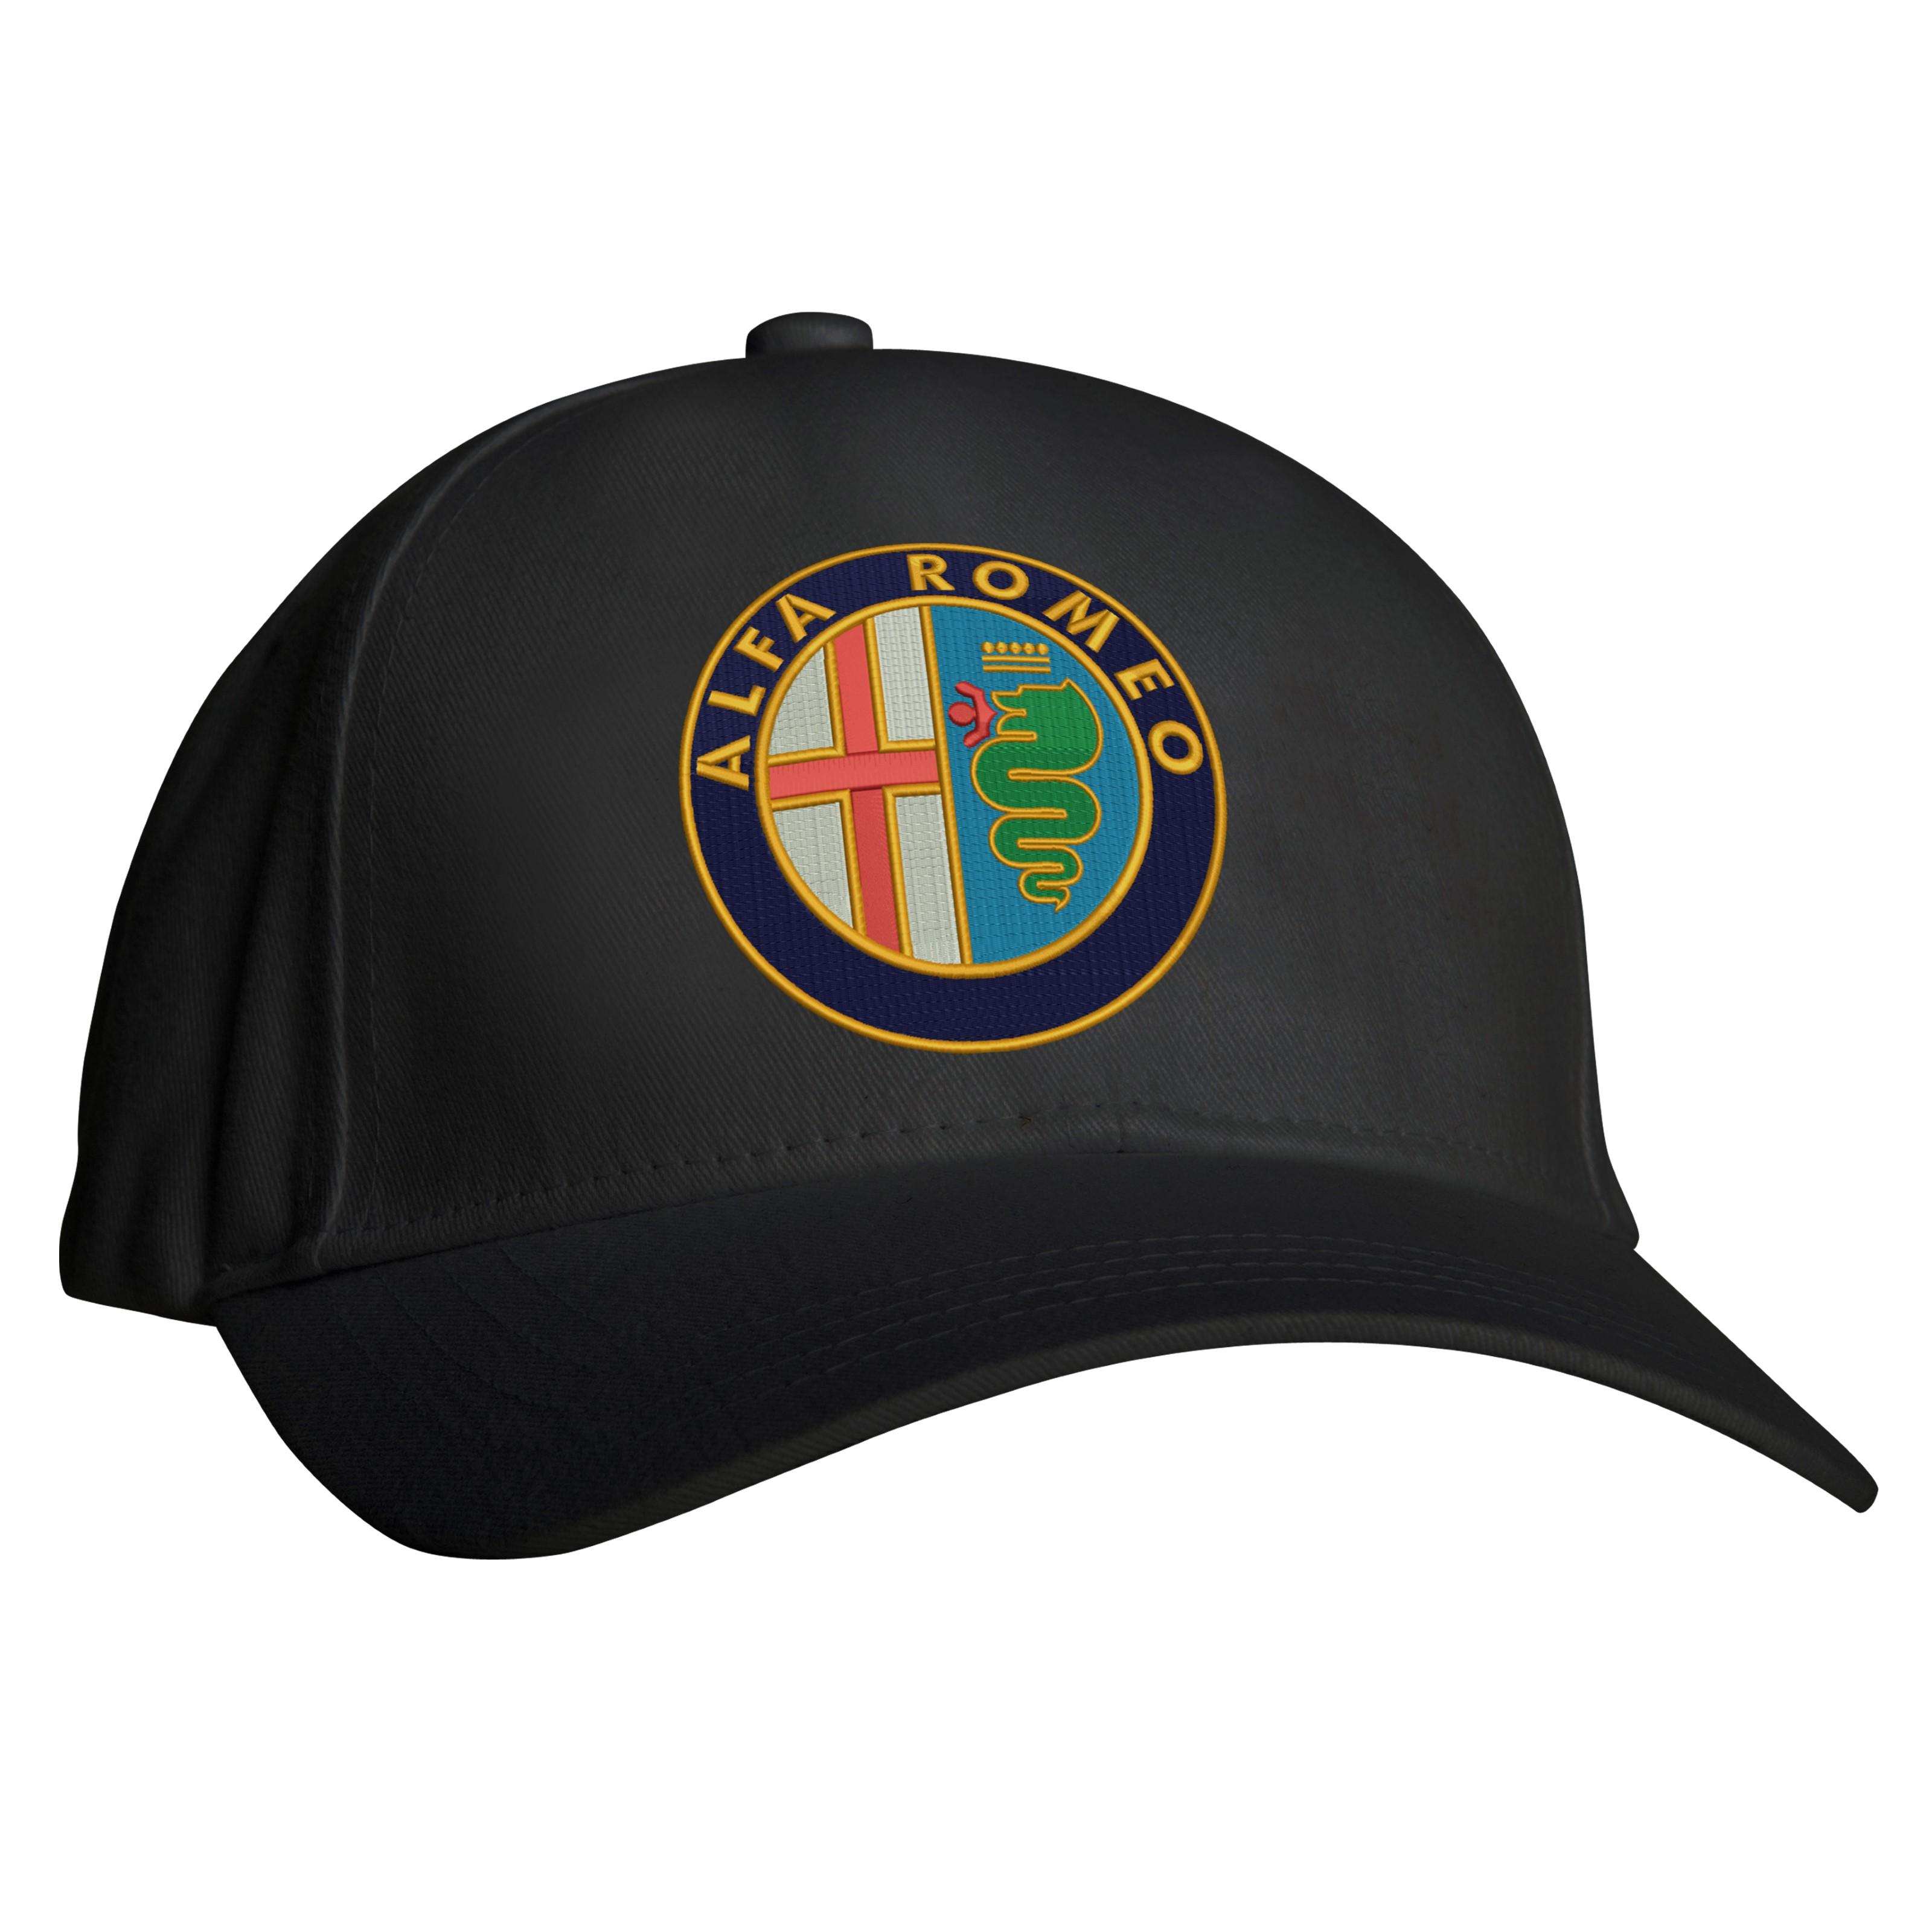 Embroidered Alfa Romeo Logo Baseball Cap Workwear Uniform Sports